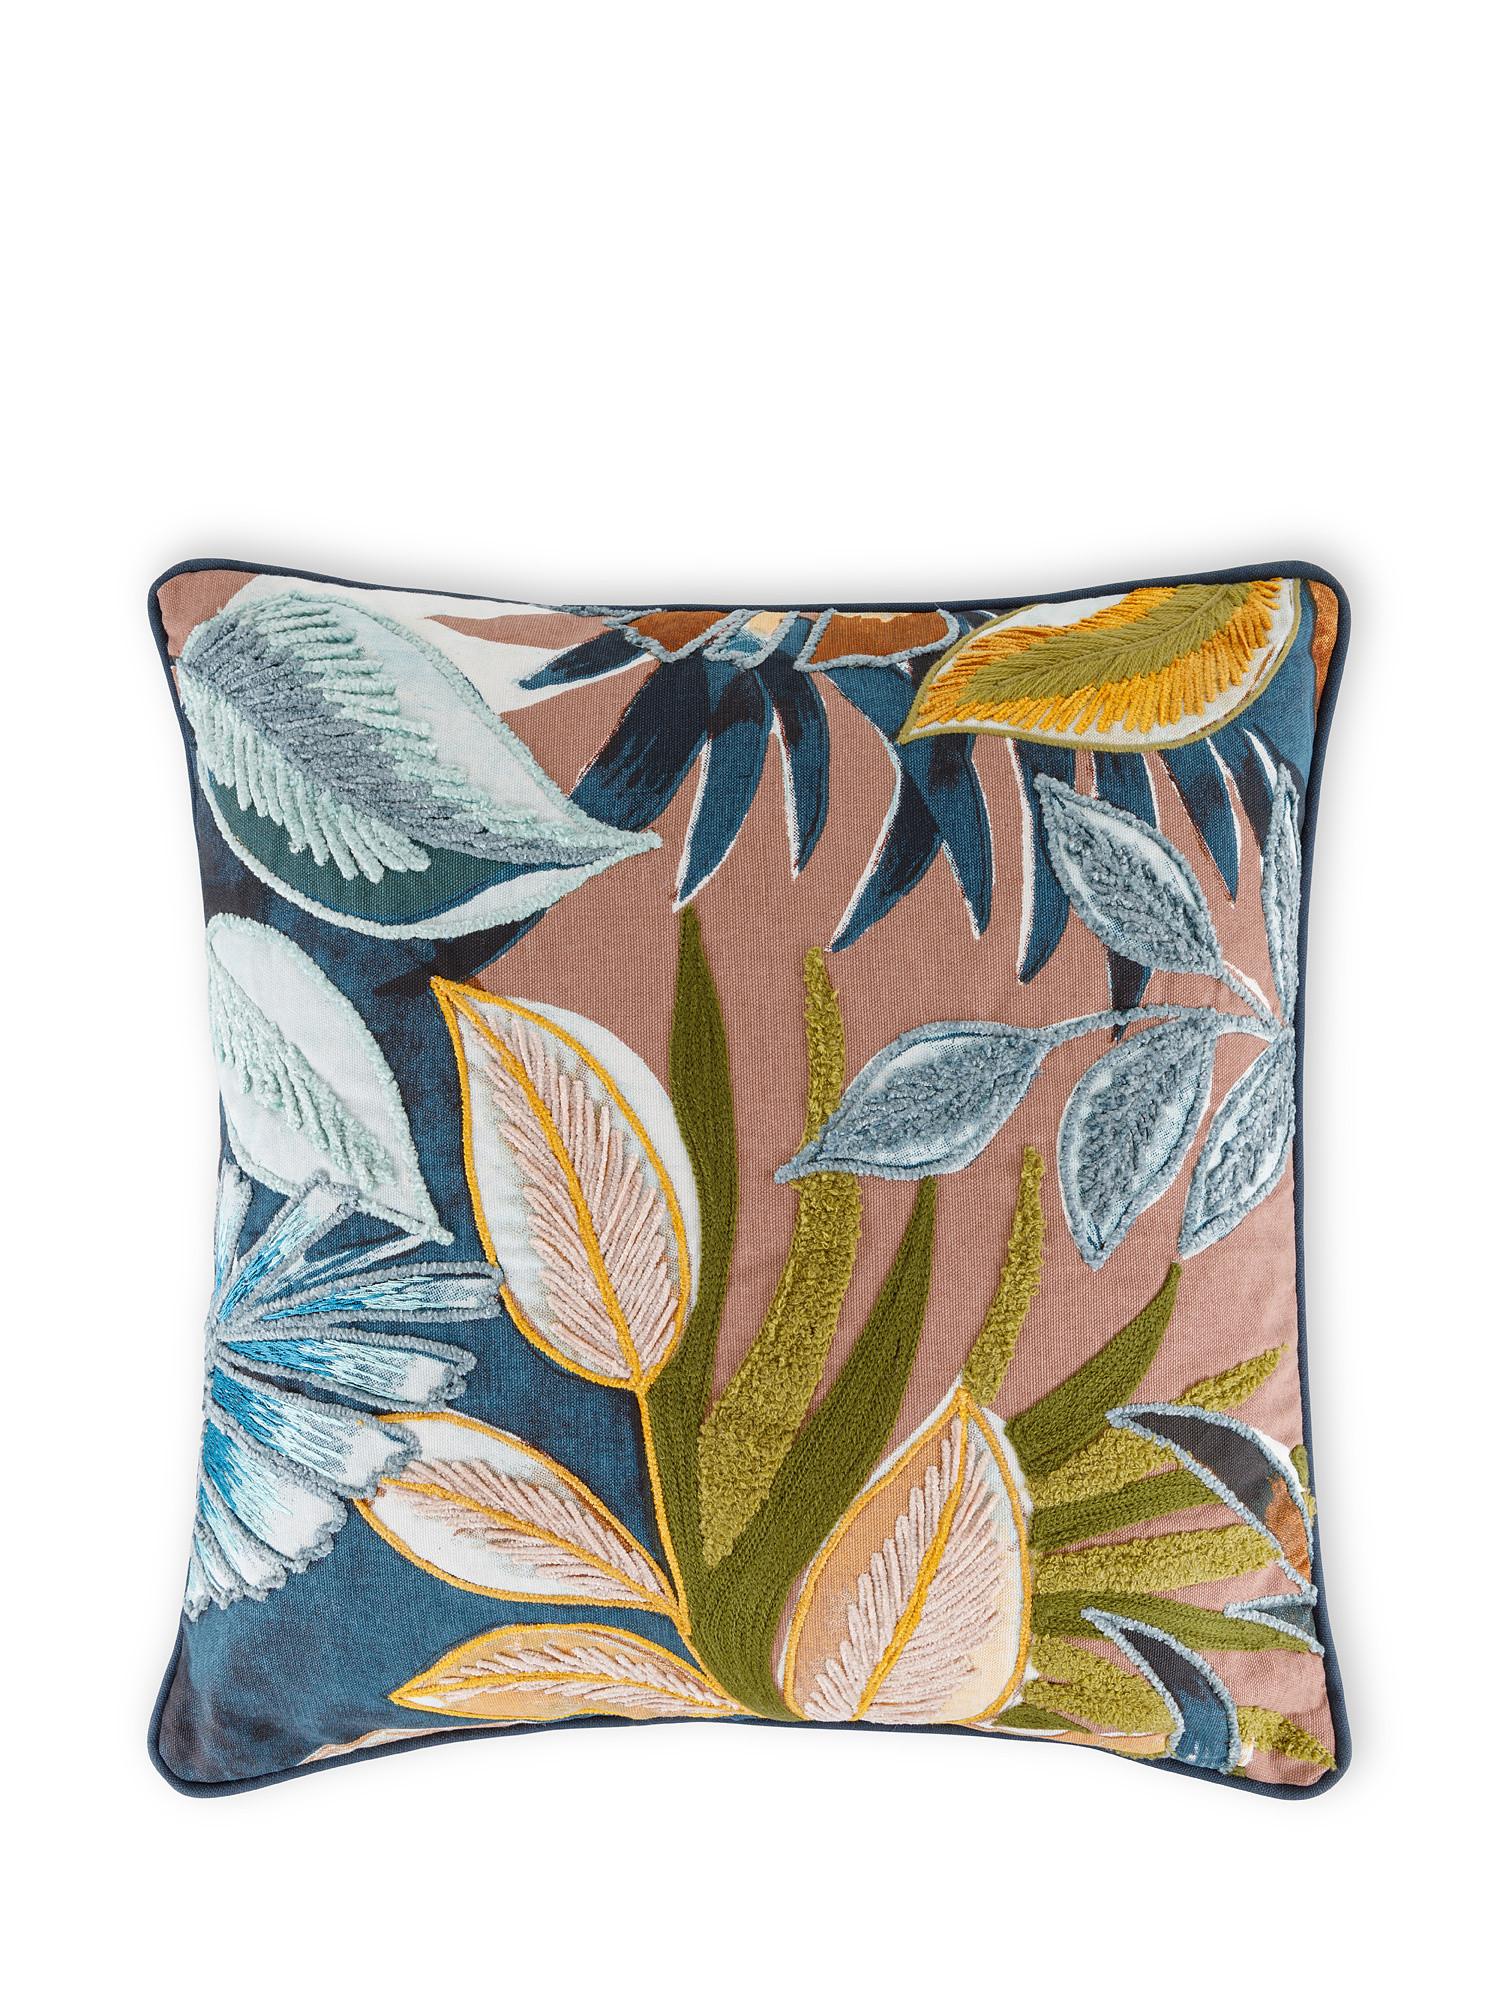 Cuscino cotone ricamo piante 45x45cm, Multicolor, large image number 0